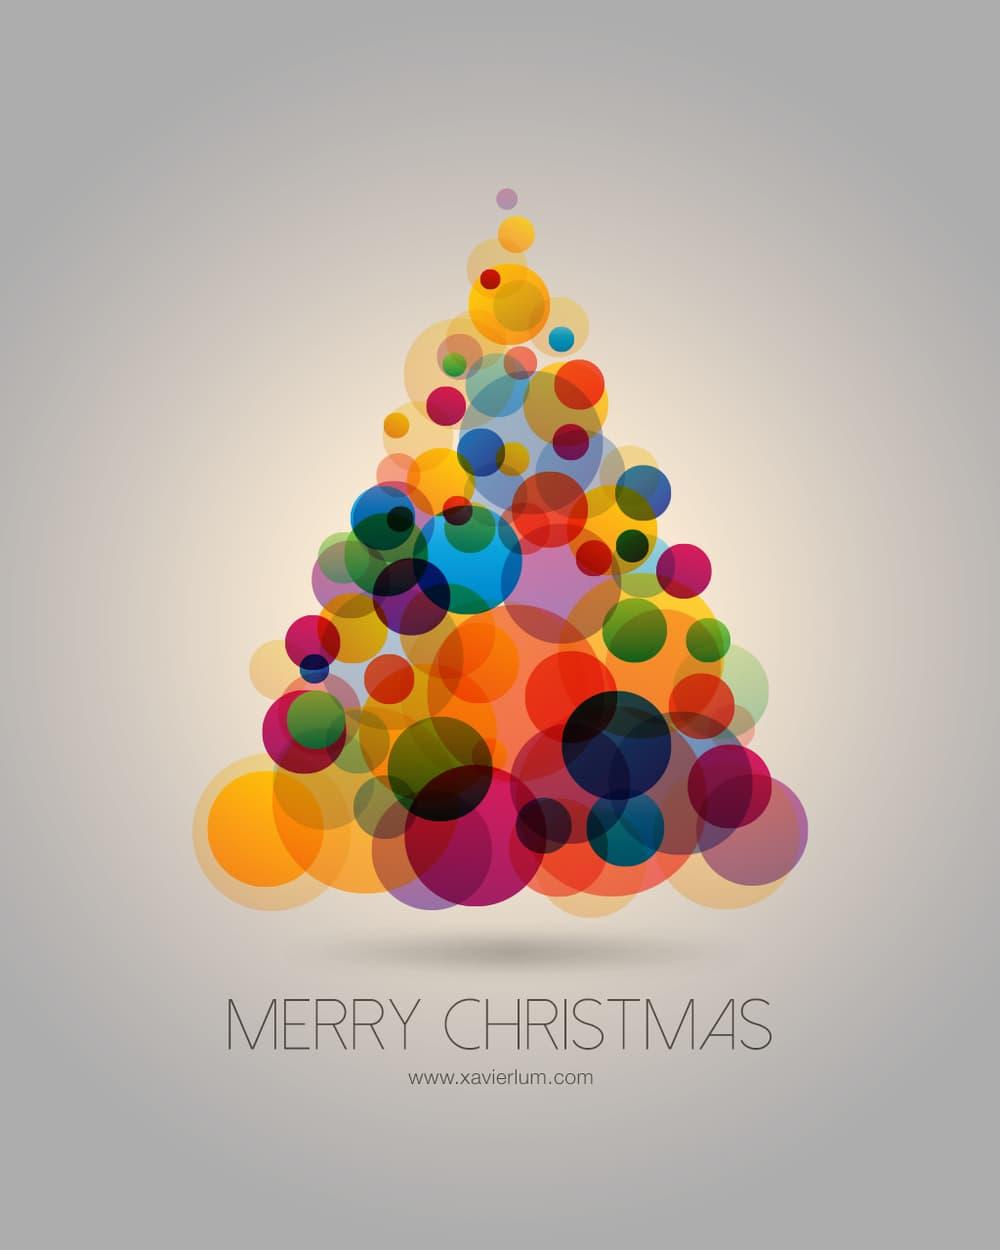 Merry Christmas 2013 1